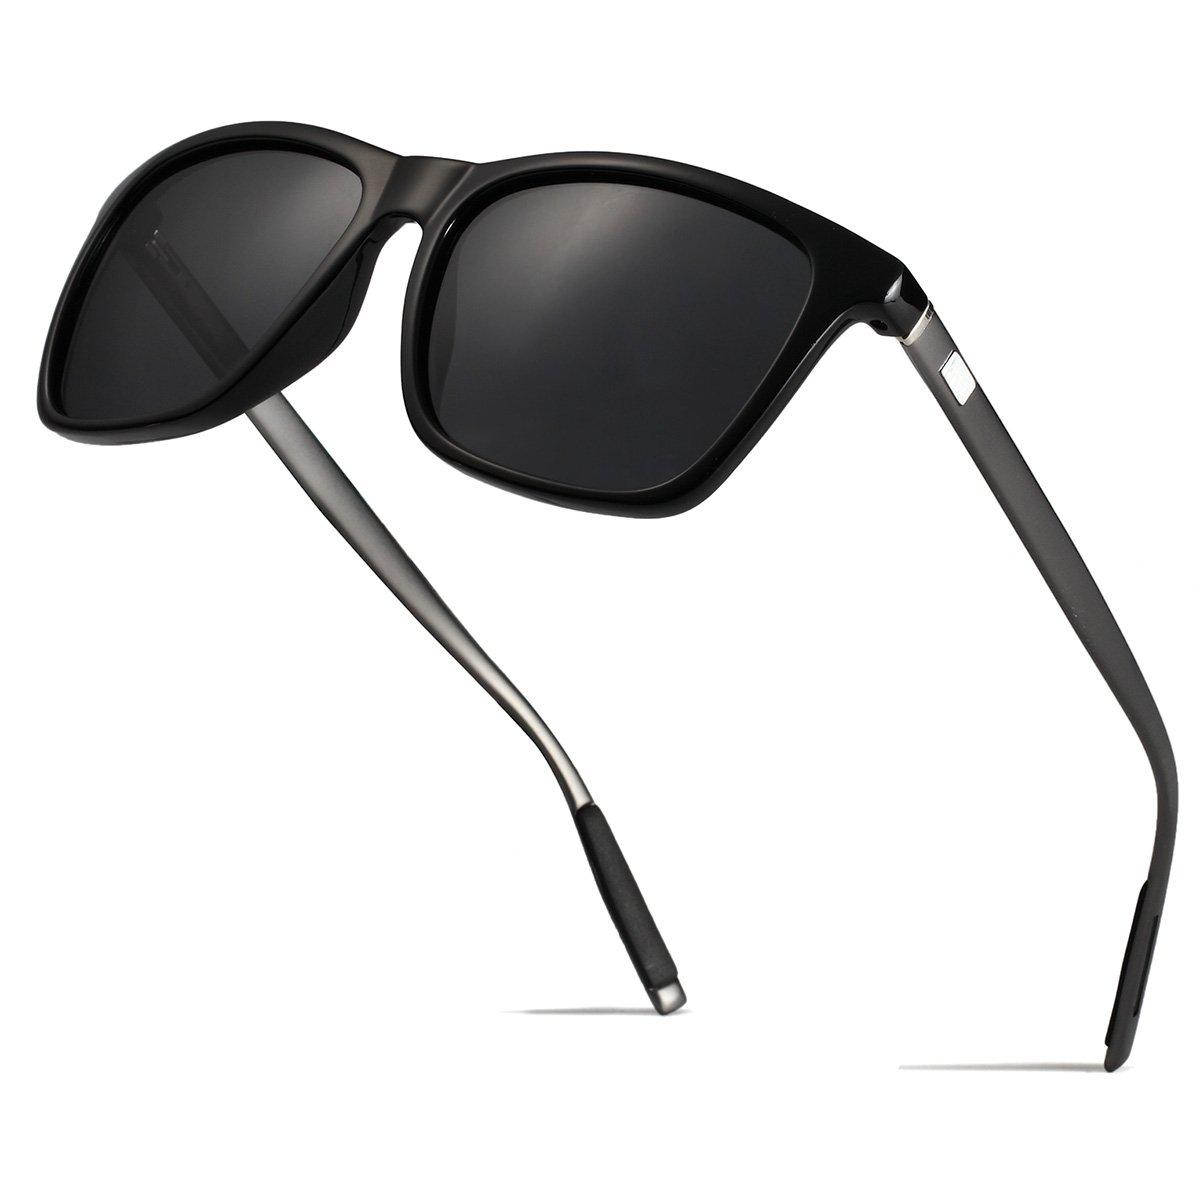 95ef3b85df Amazon.com  Mens Retro Wayfarer Polarized Sunglasses UV protection  Sunglasses for men Black  Clothing